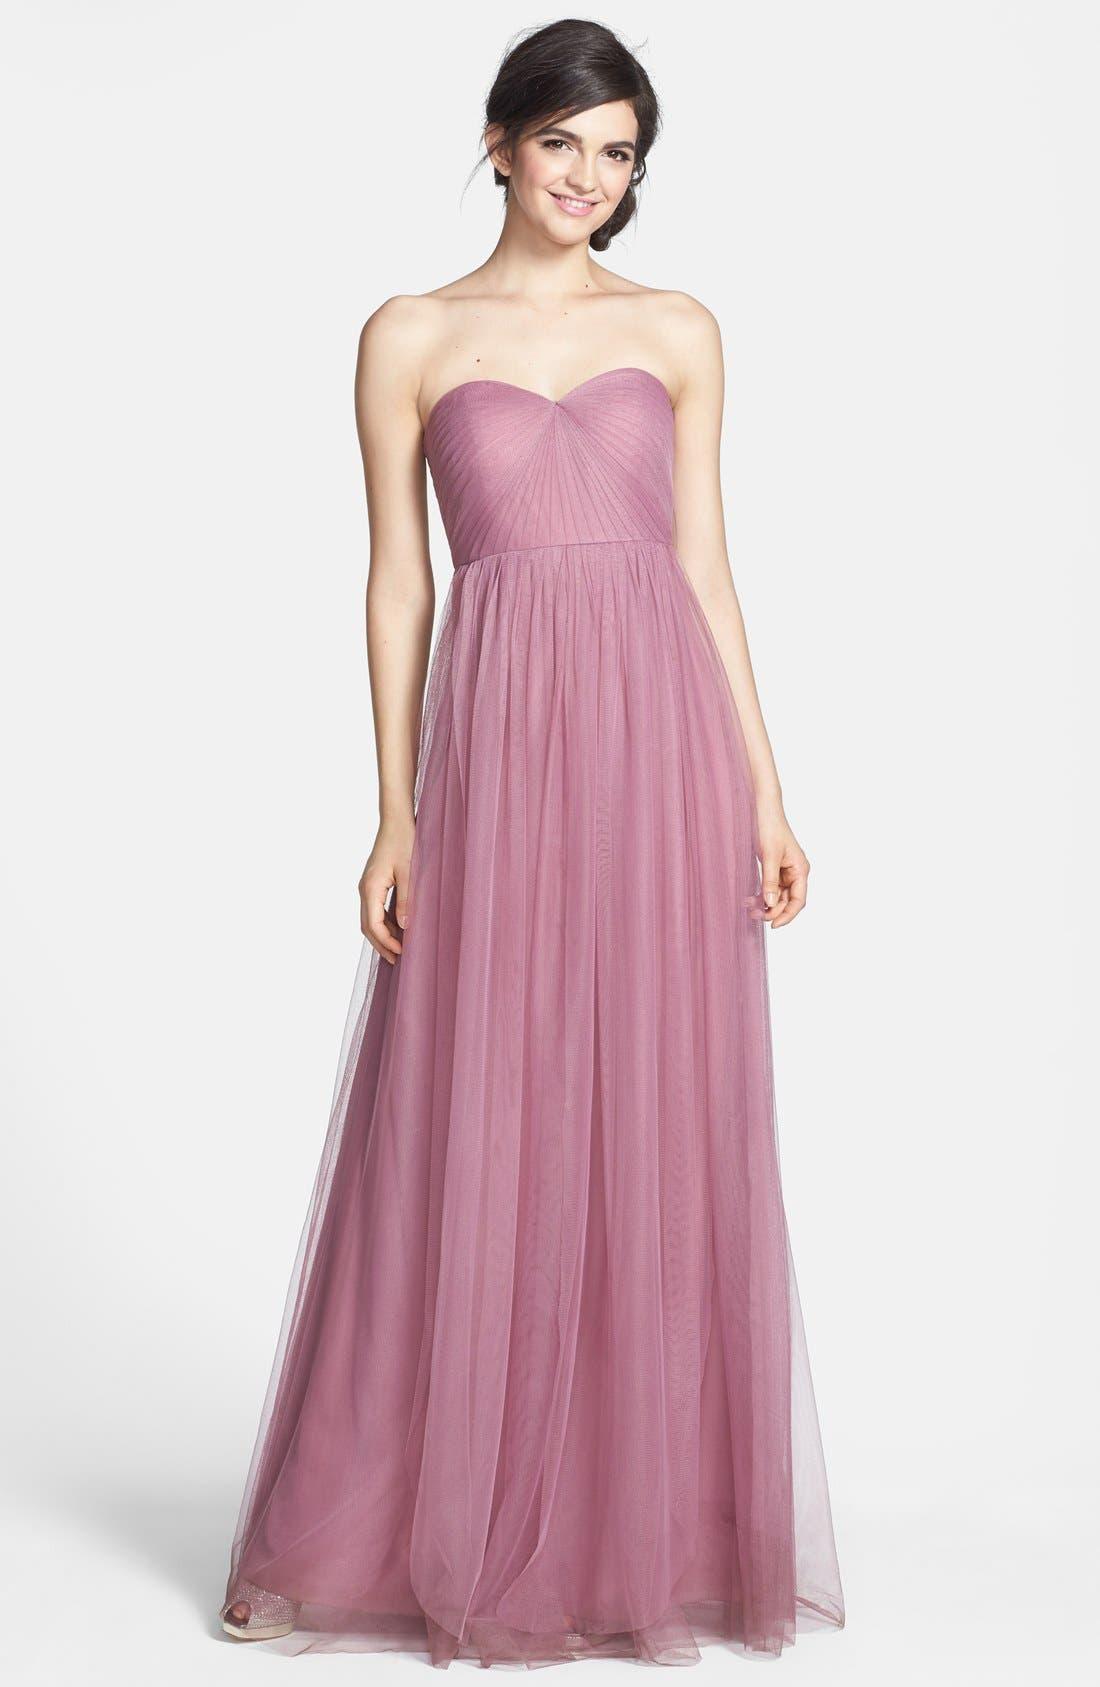 Main Image - Jenny Yoo 'Annabelle' Convertible Tulle Column Dress